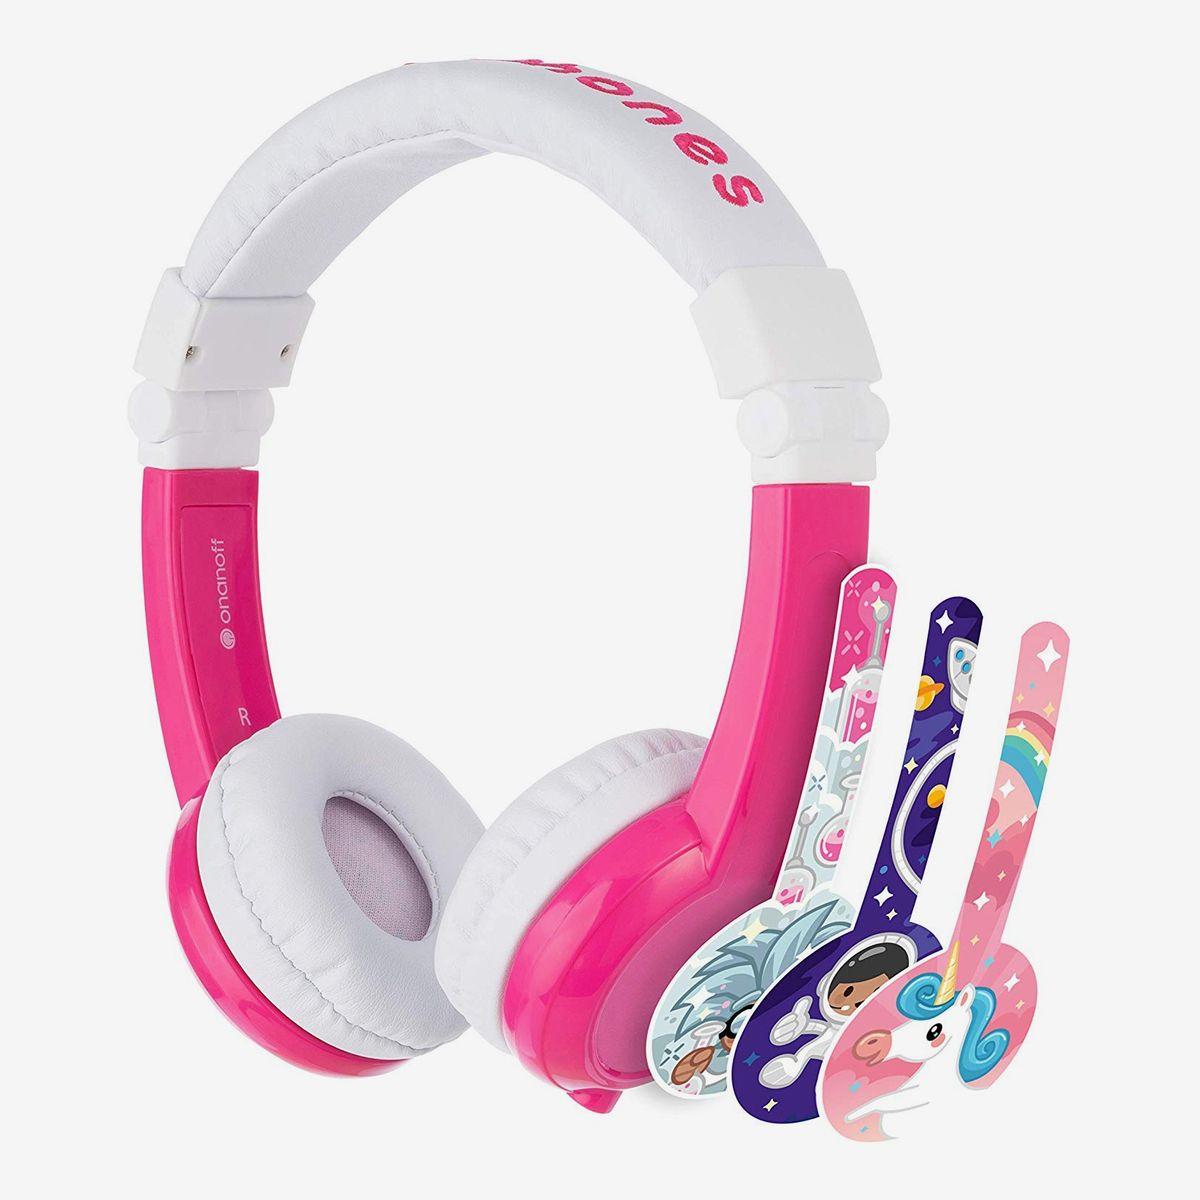 Blue Kids Headphones Children Girls Boys Teens Volume Limiting Foldable and Durable Headphone Headband for School Home and Travel